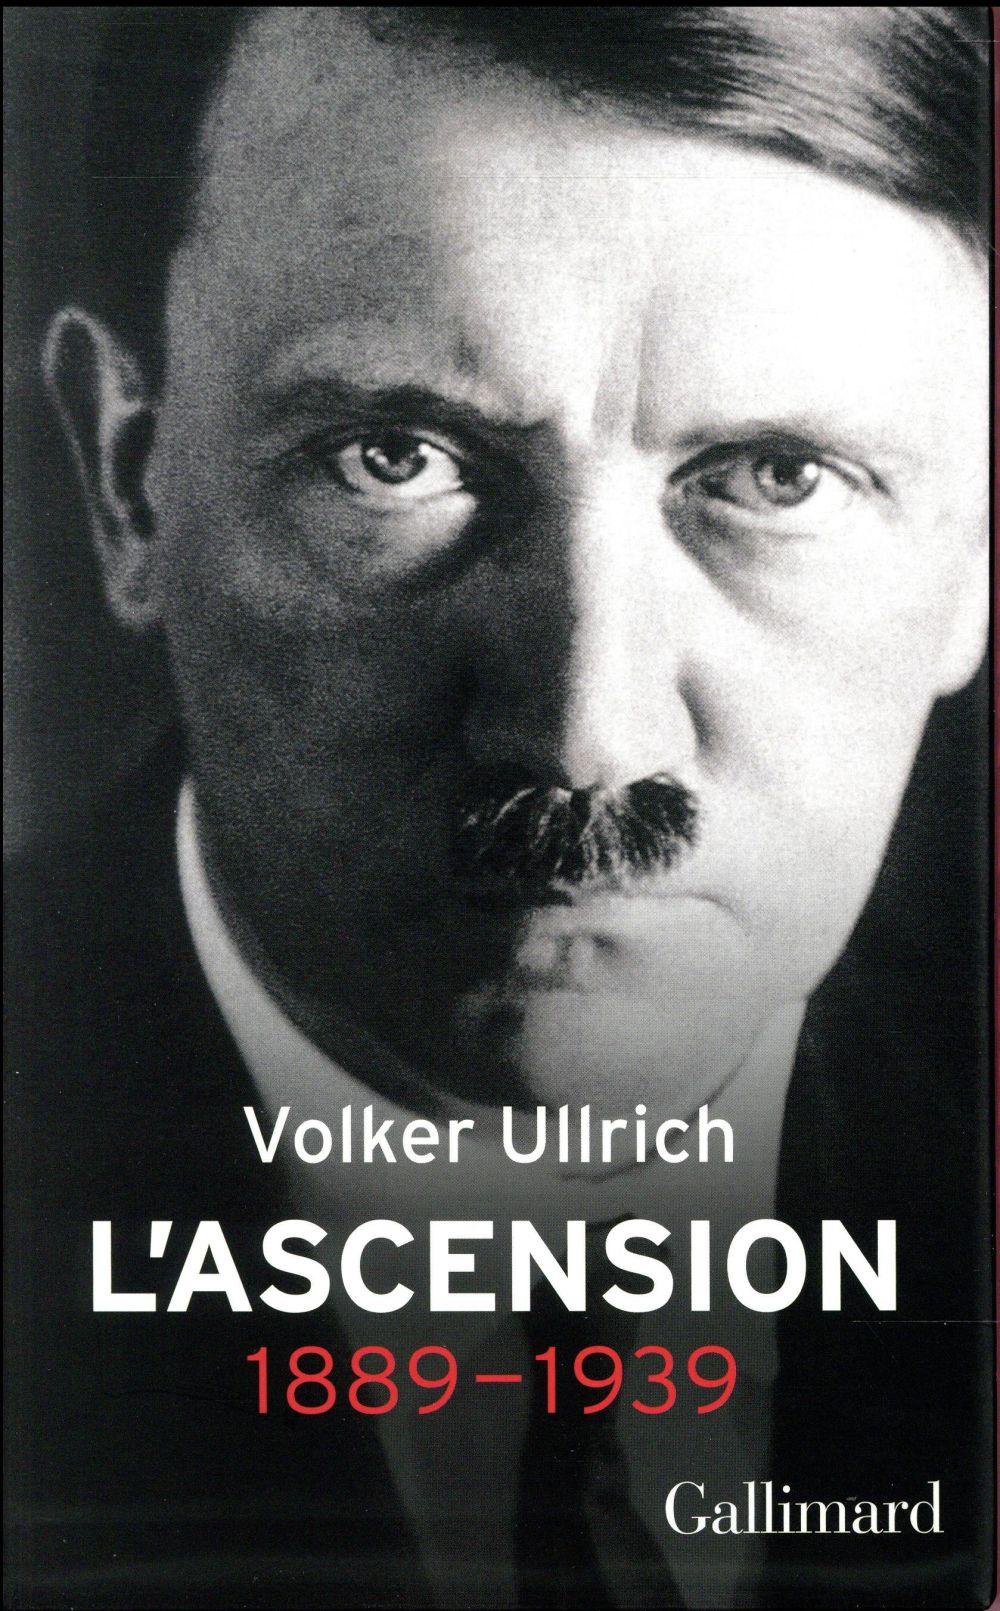 ADOLF HITLER, UNE BIOGRAPHIE T.1  -  L'ASCENSION, 1889-1939